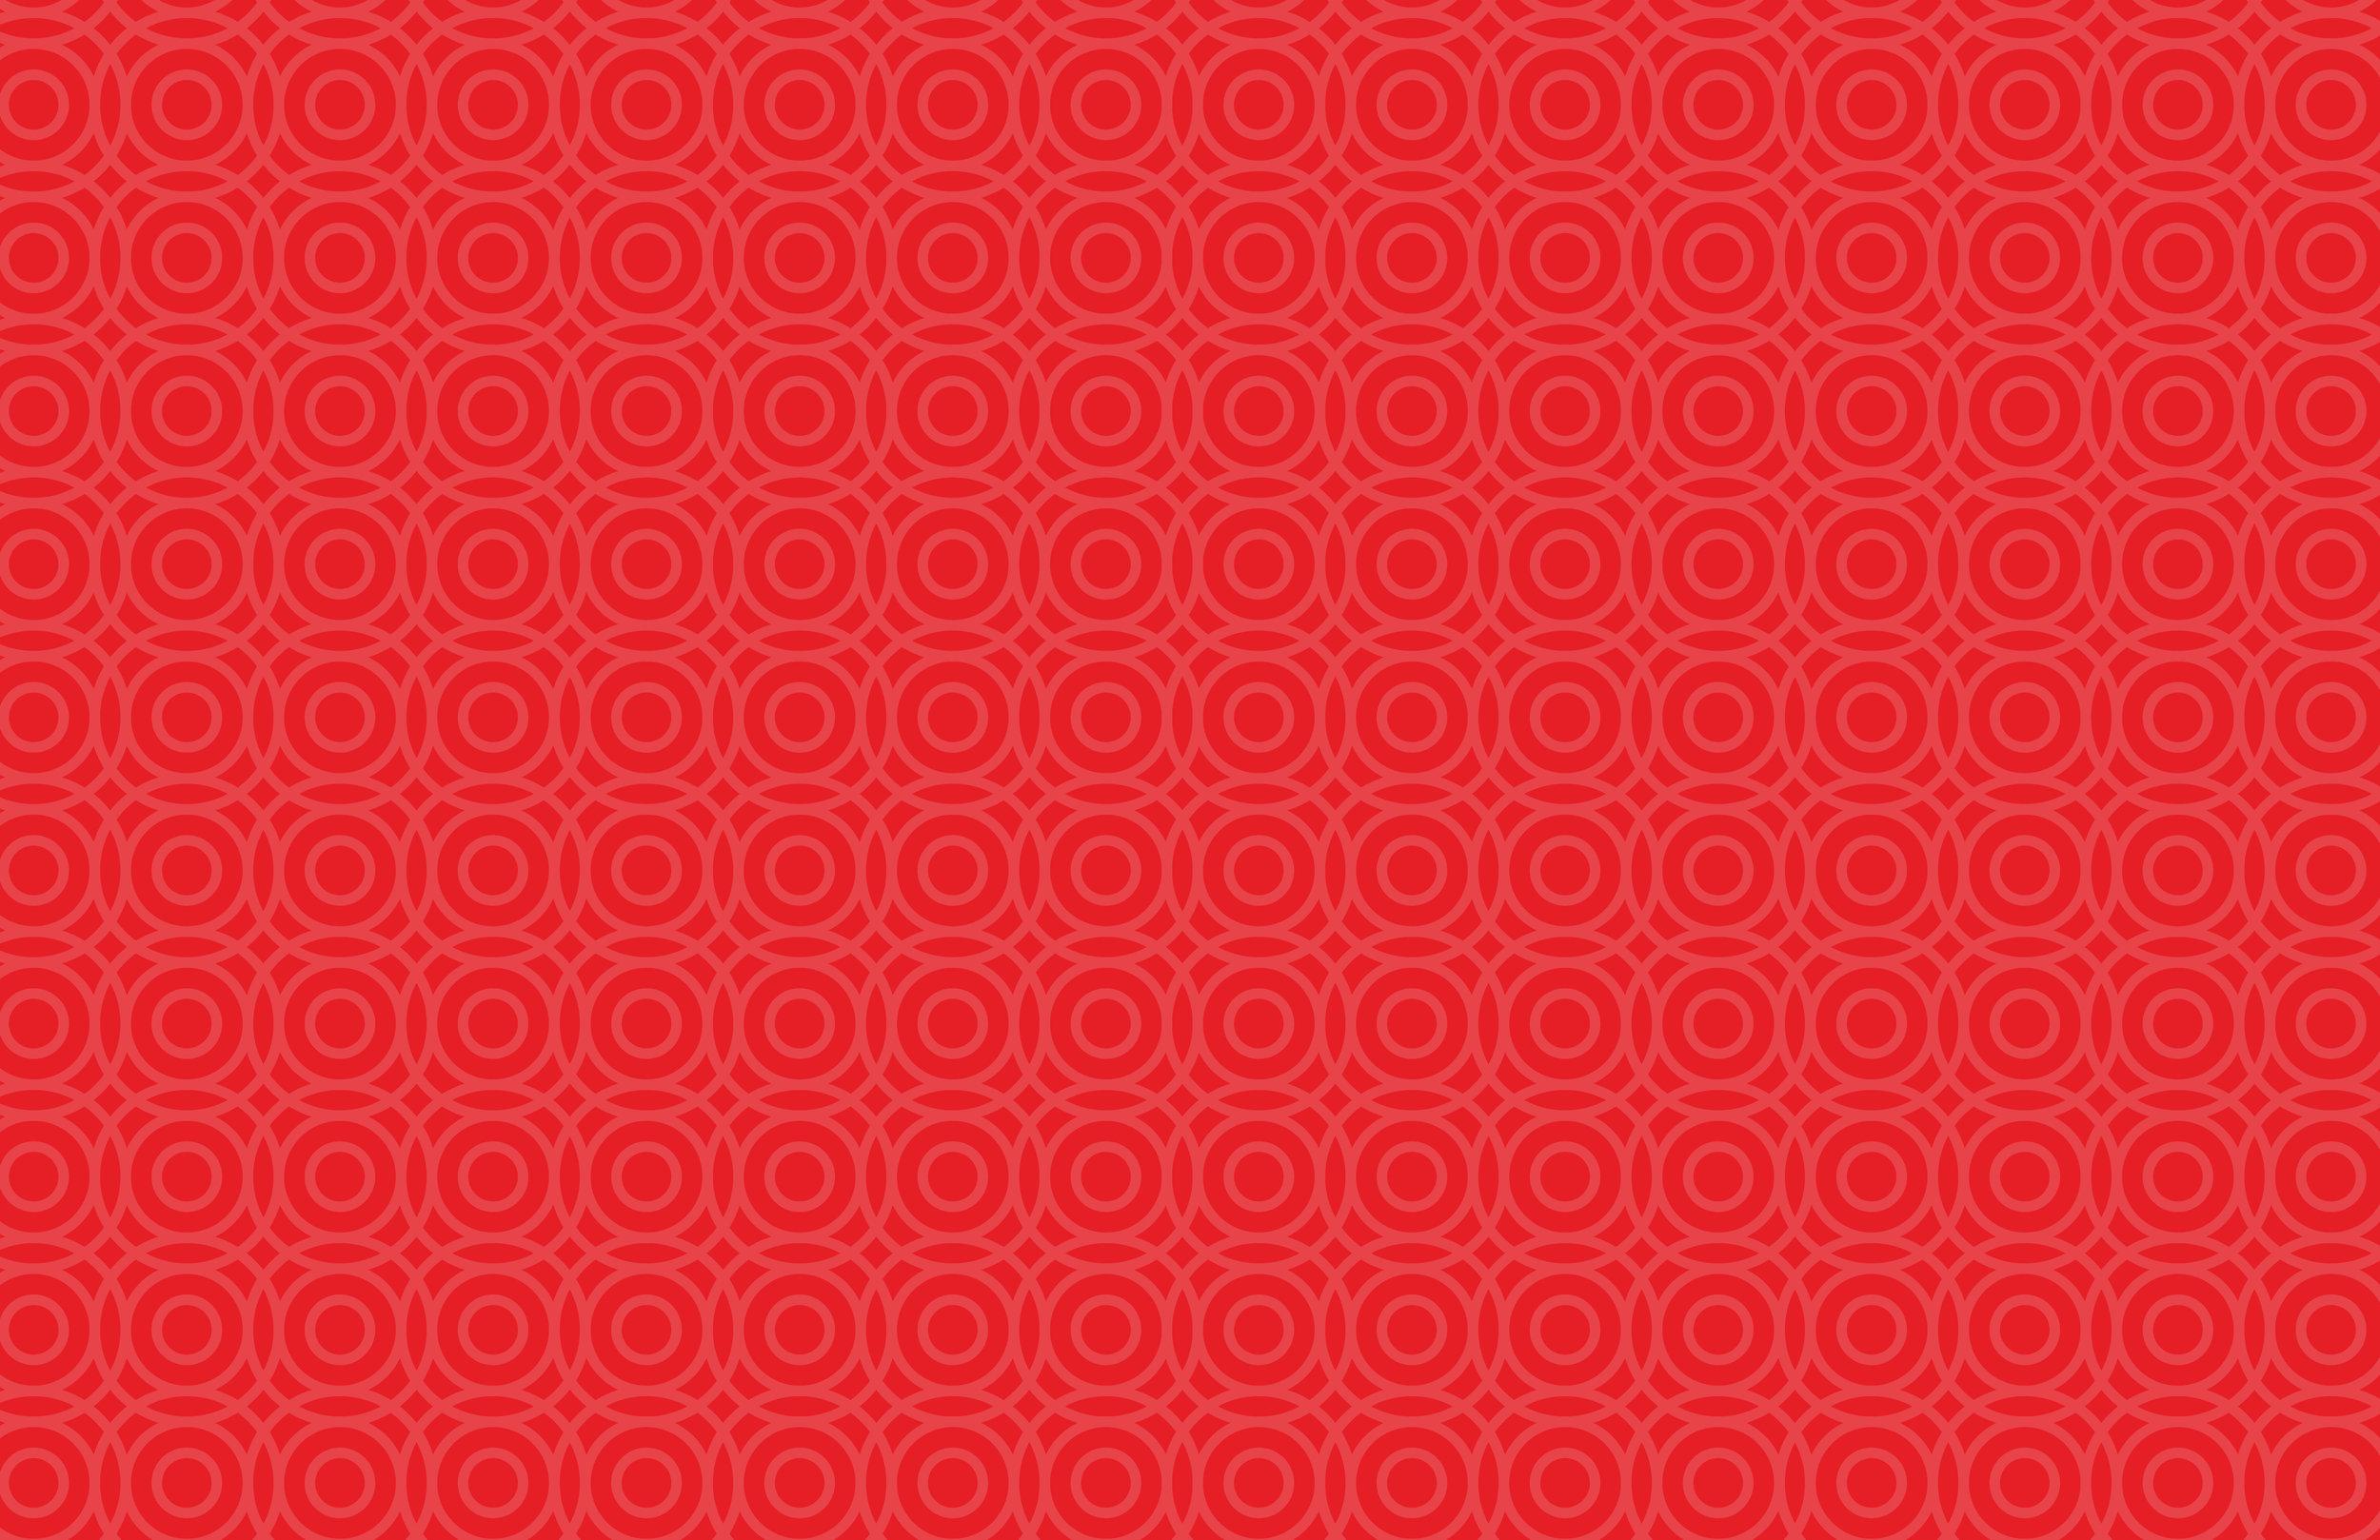 CommunityChords_Pattern_Echoes_Red.jpg